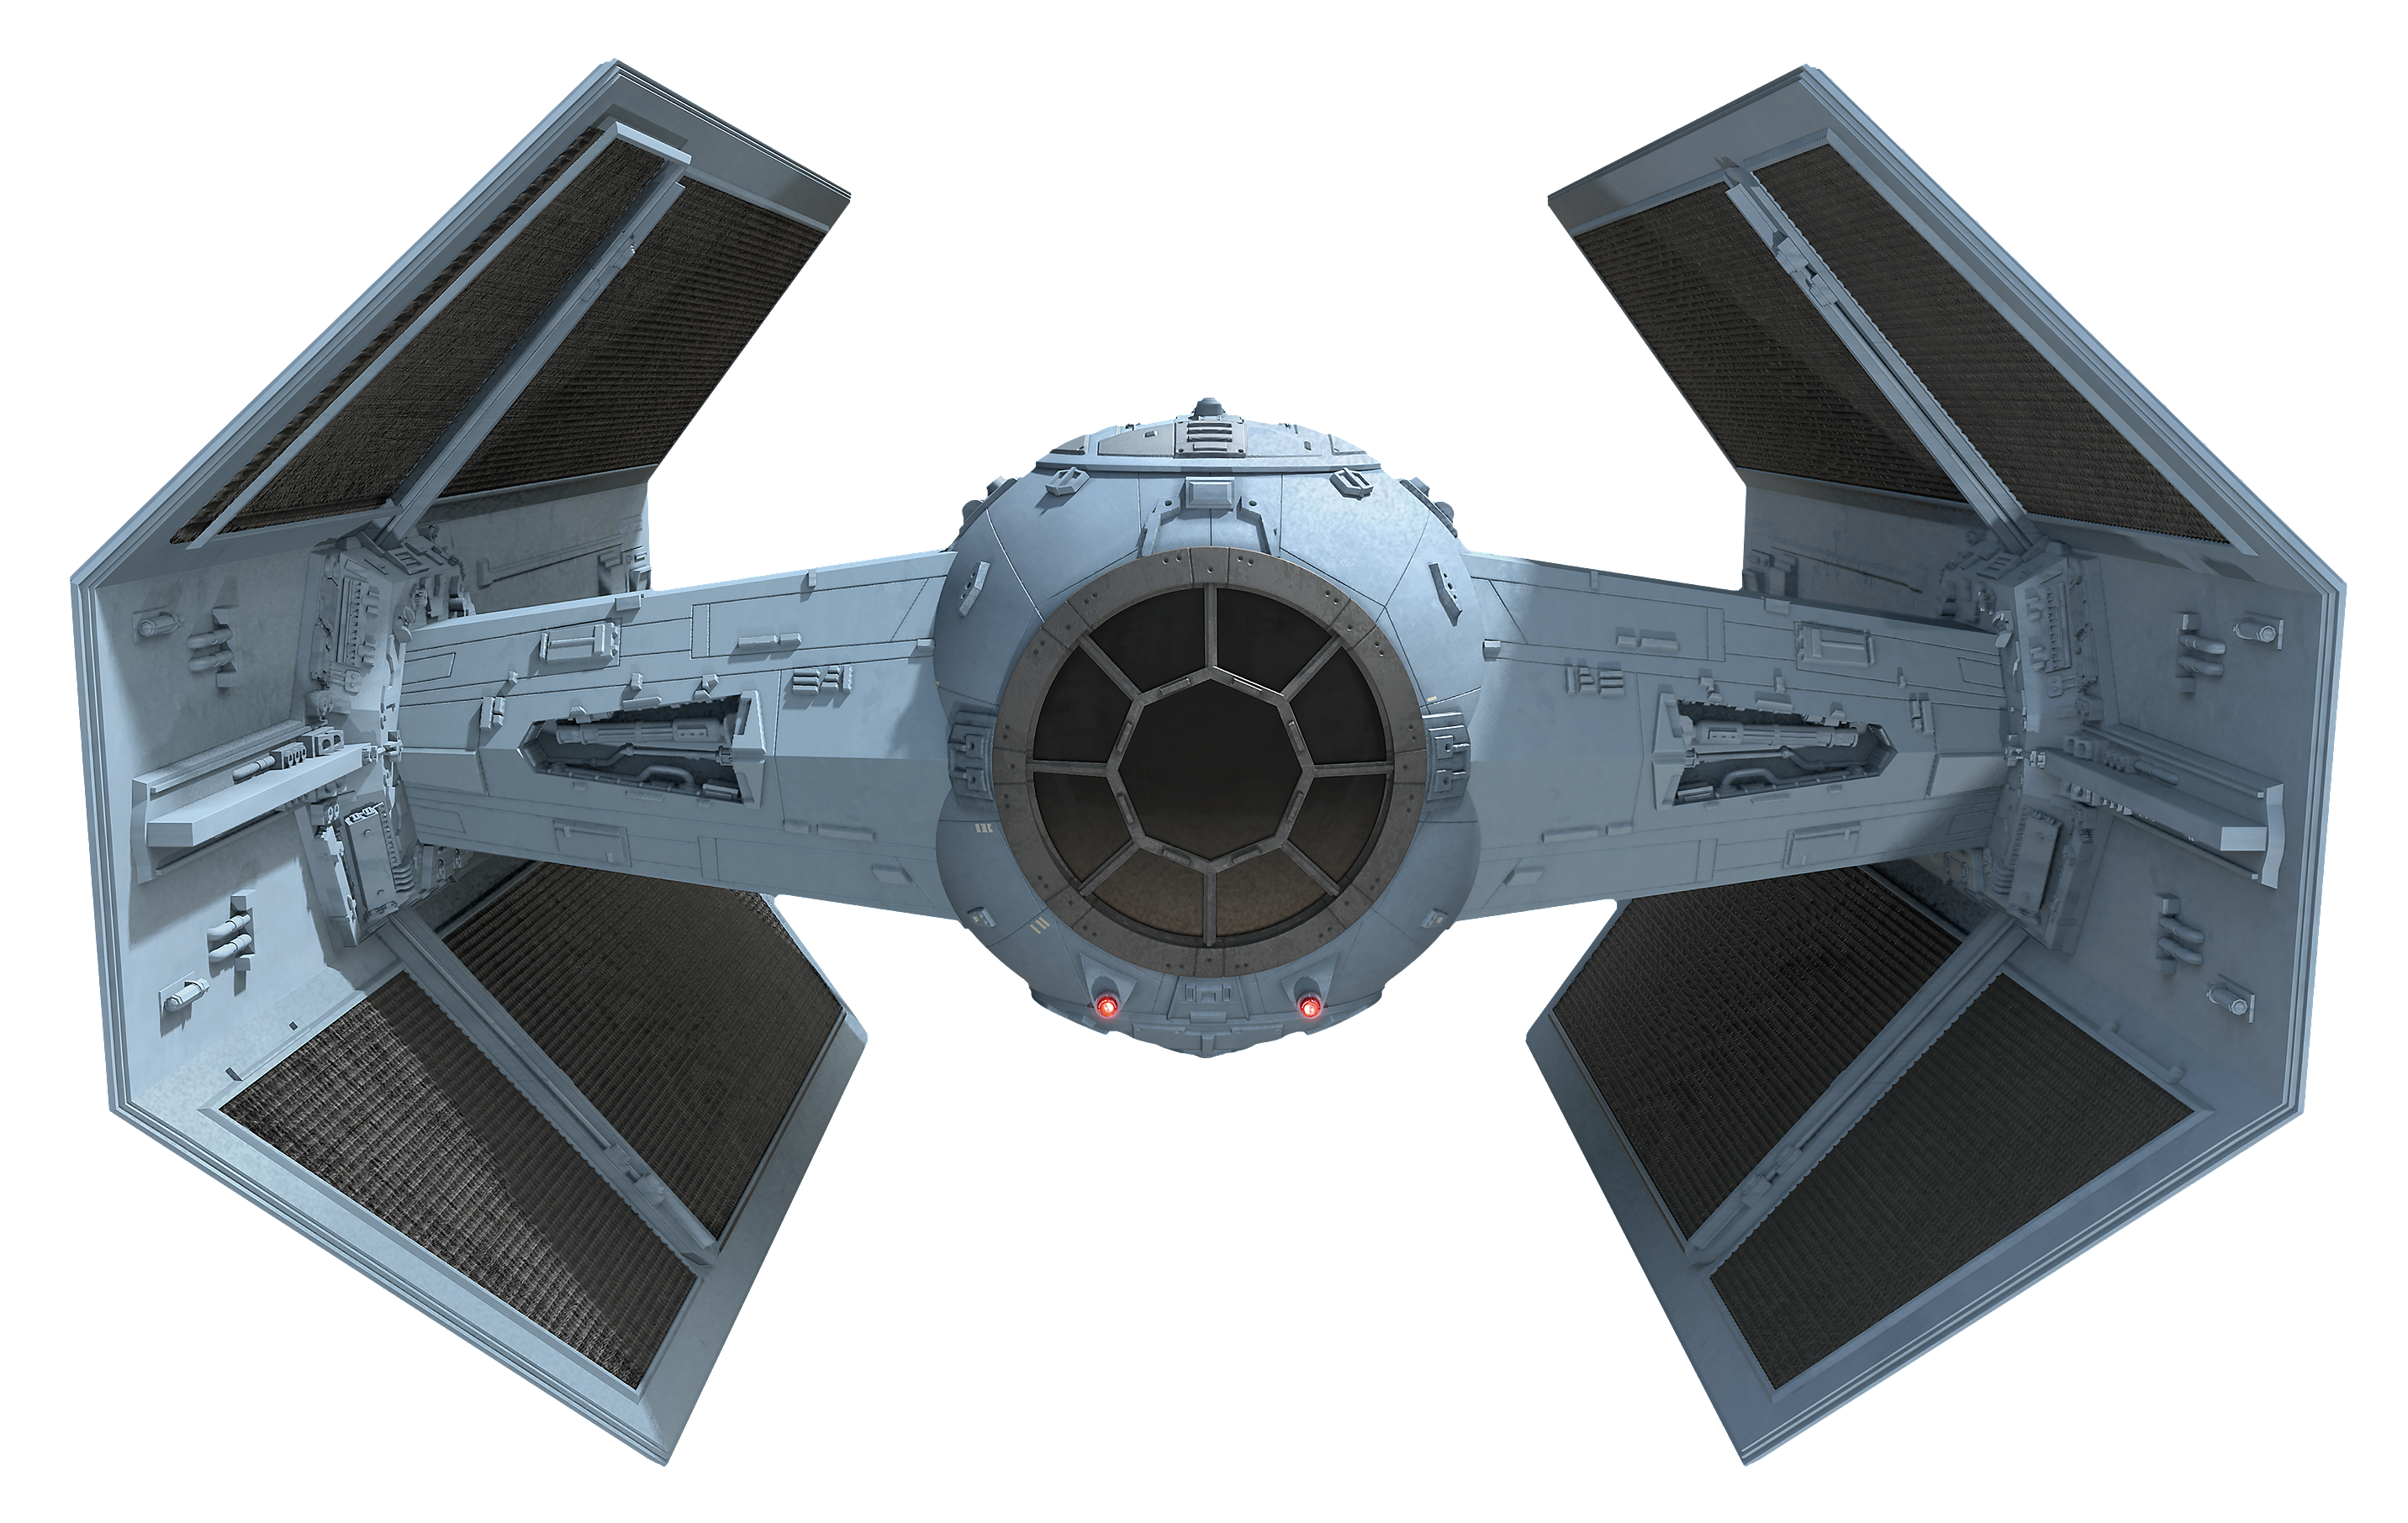 Tie Series Star Wars Vehicles Star Wars Ships Star Wars Images